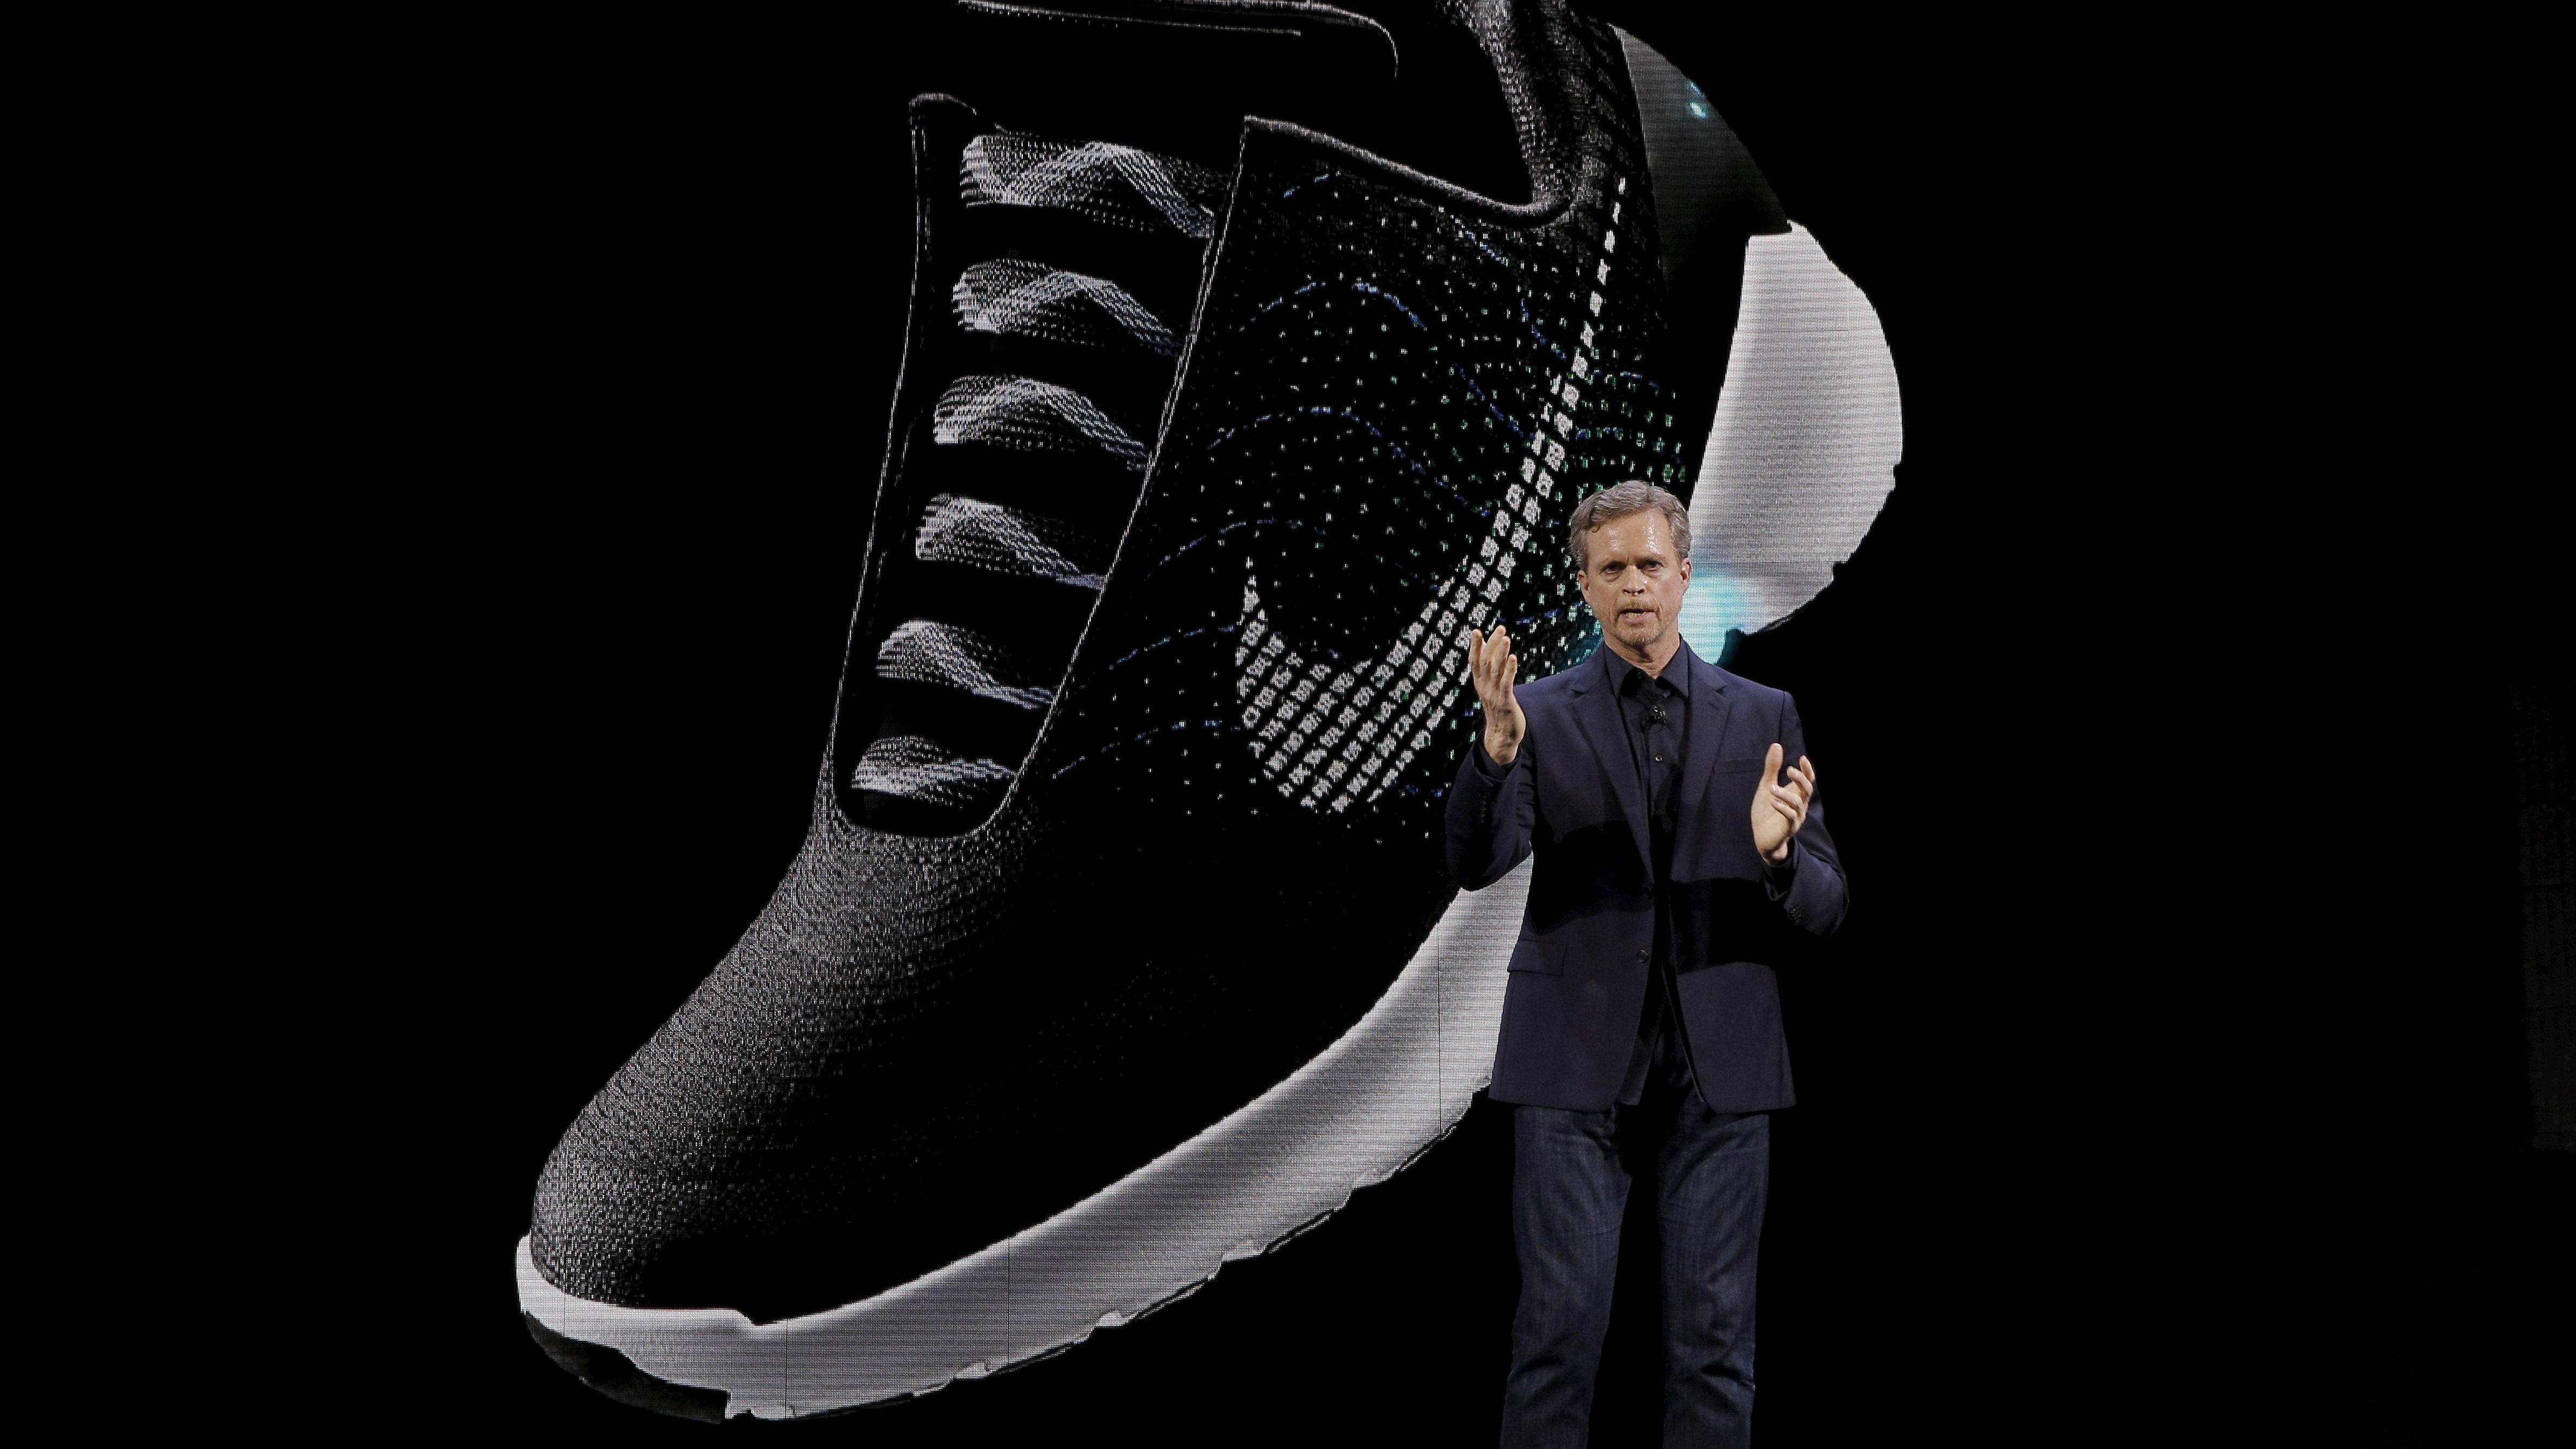 The Nike HyperAdapt 1.0 self-lacing shoe is displayed as Nike CEO Mark  Parker speaks 866296792213